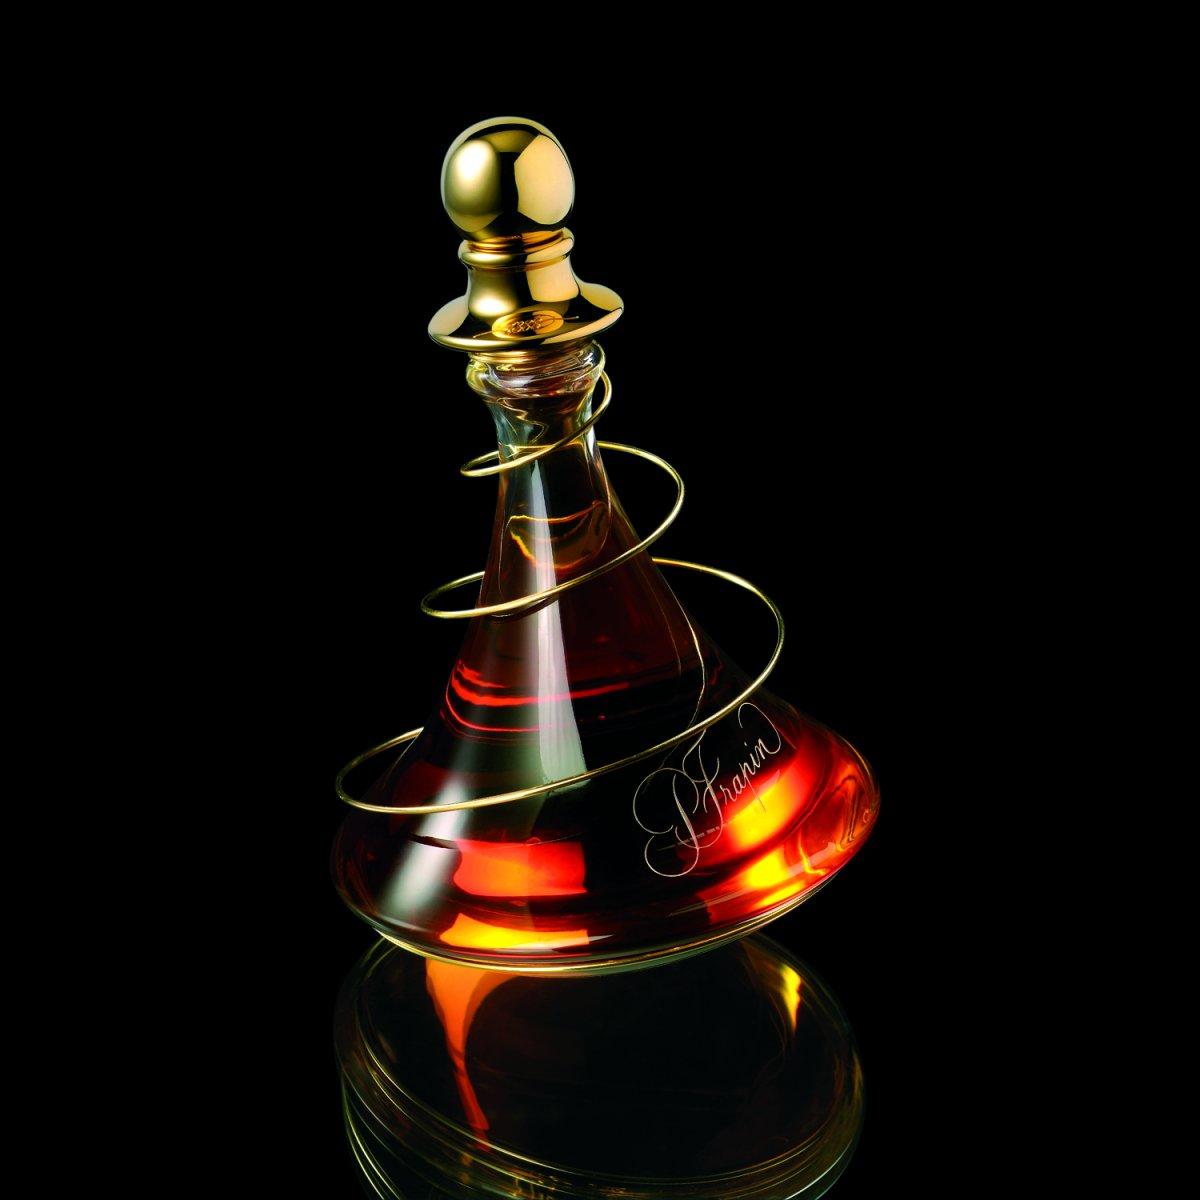 https://alliamaredhead.files.wordpress.com/2011/01/cognac252520frapin-1888.jpg